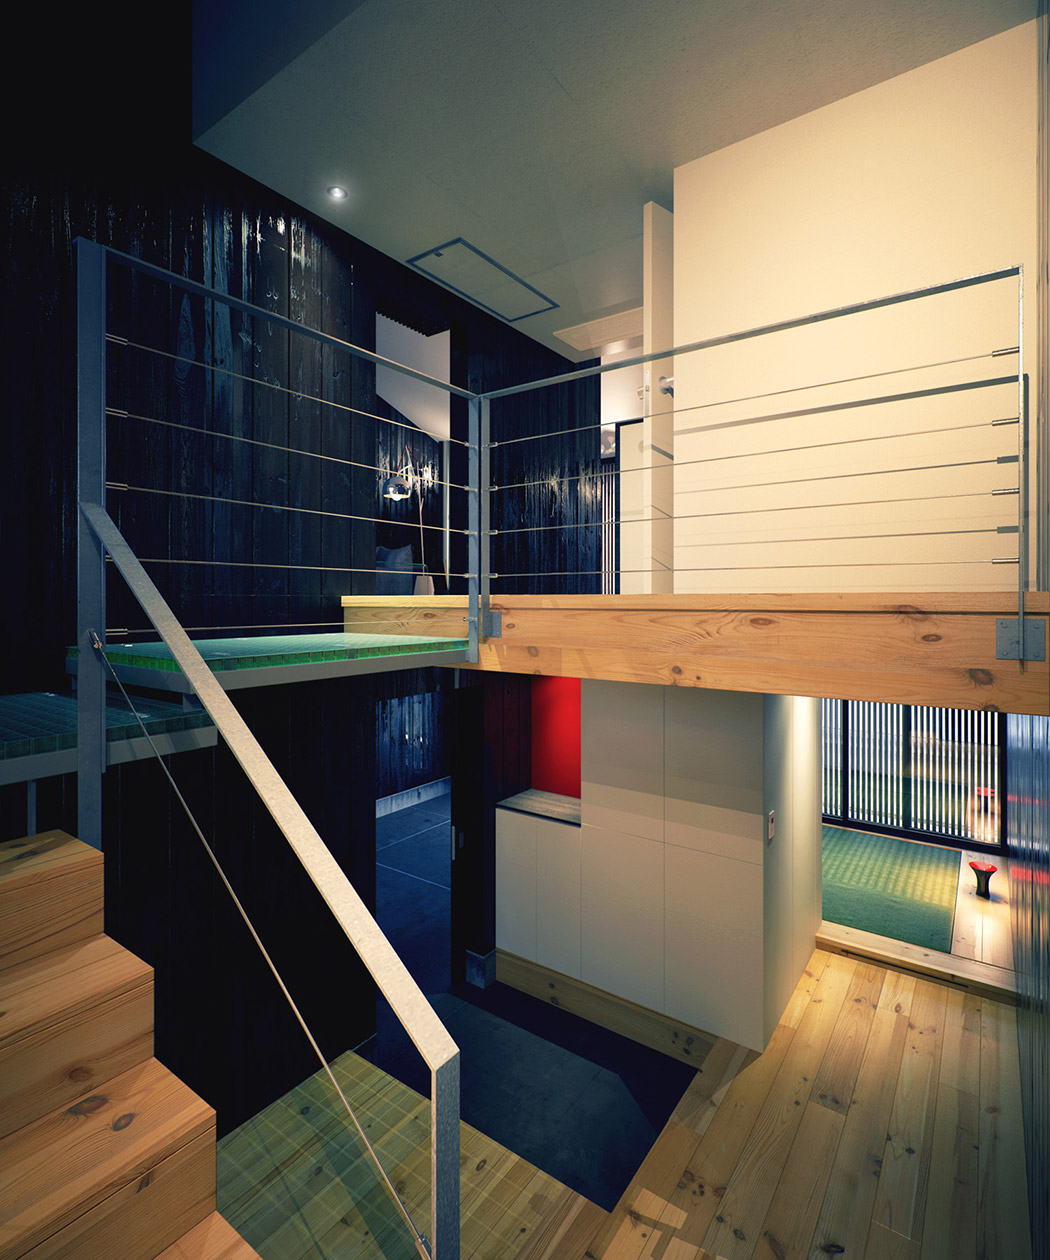 Home Design Ideas Architecture: Modern Japanese Home